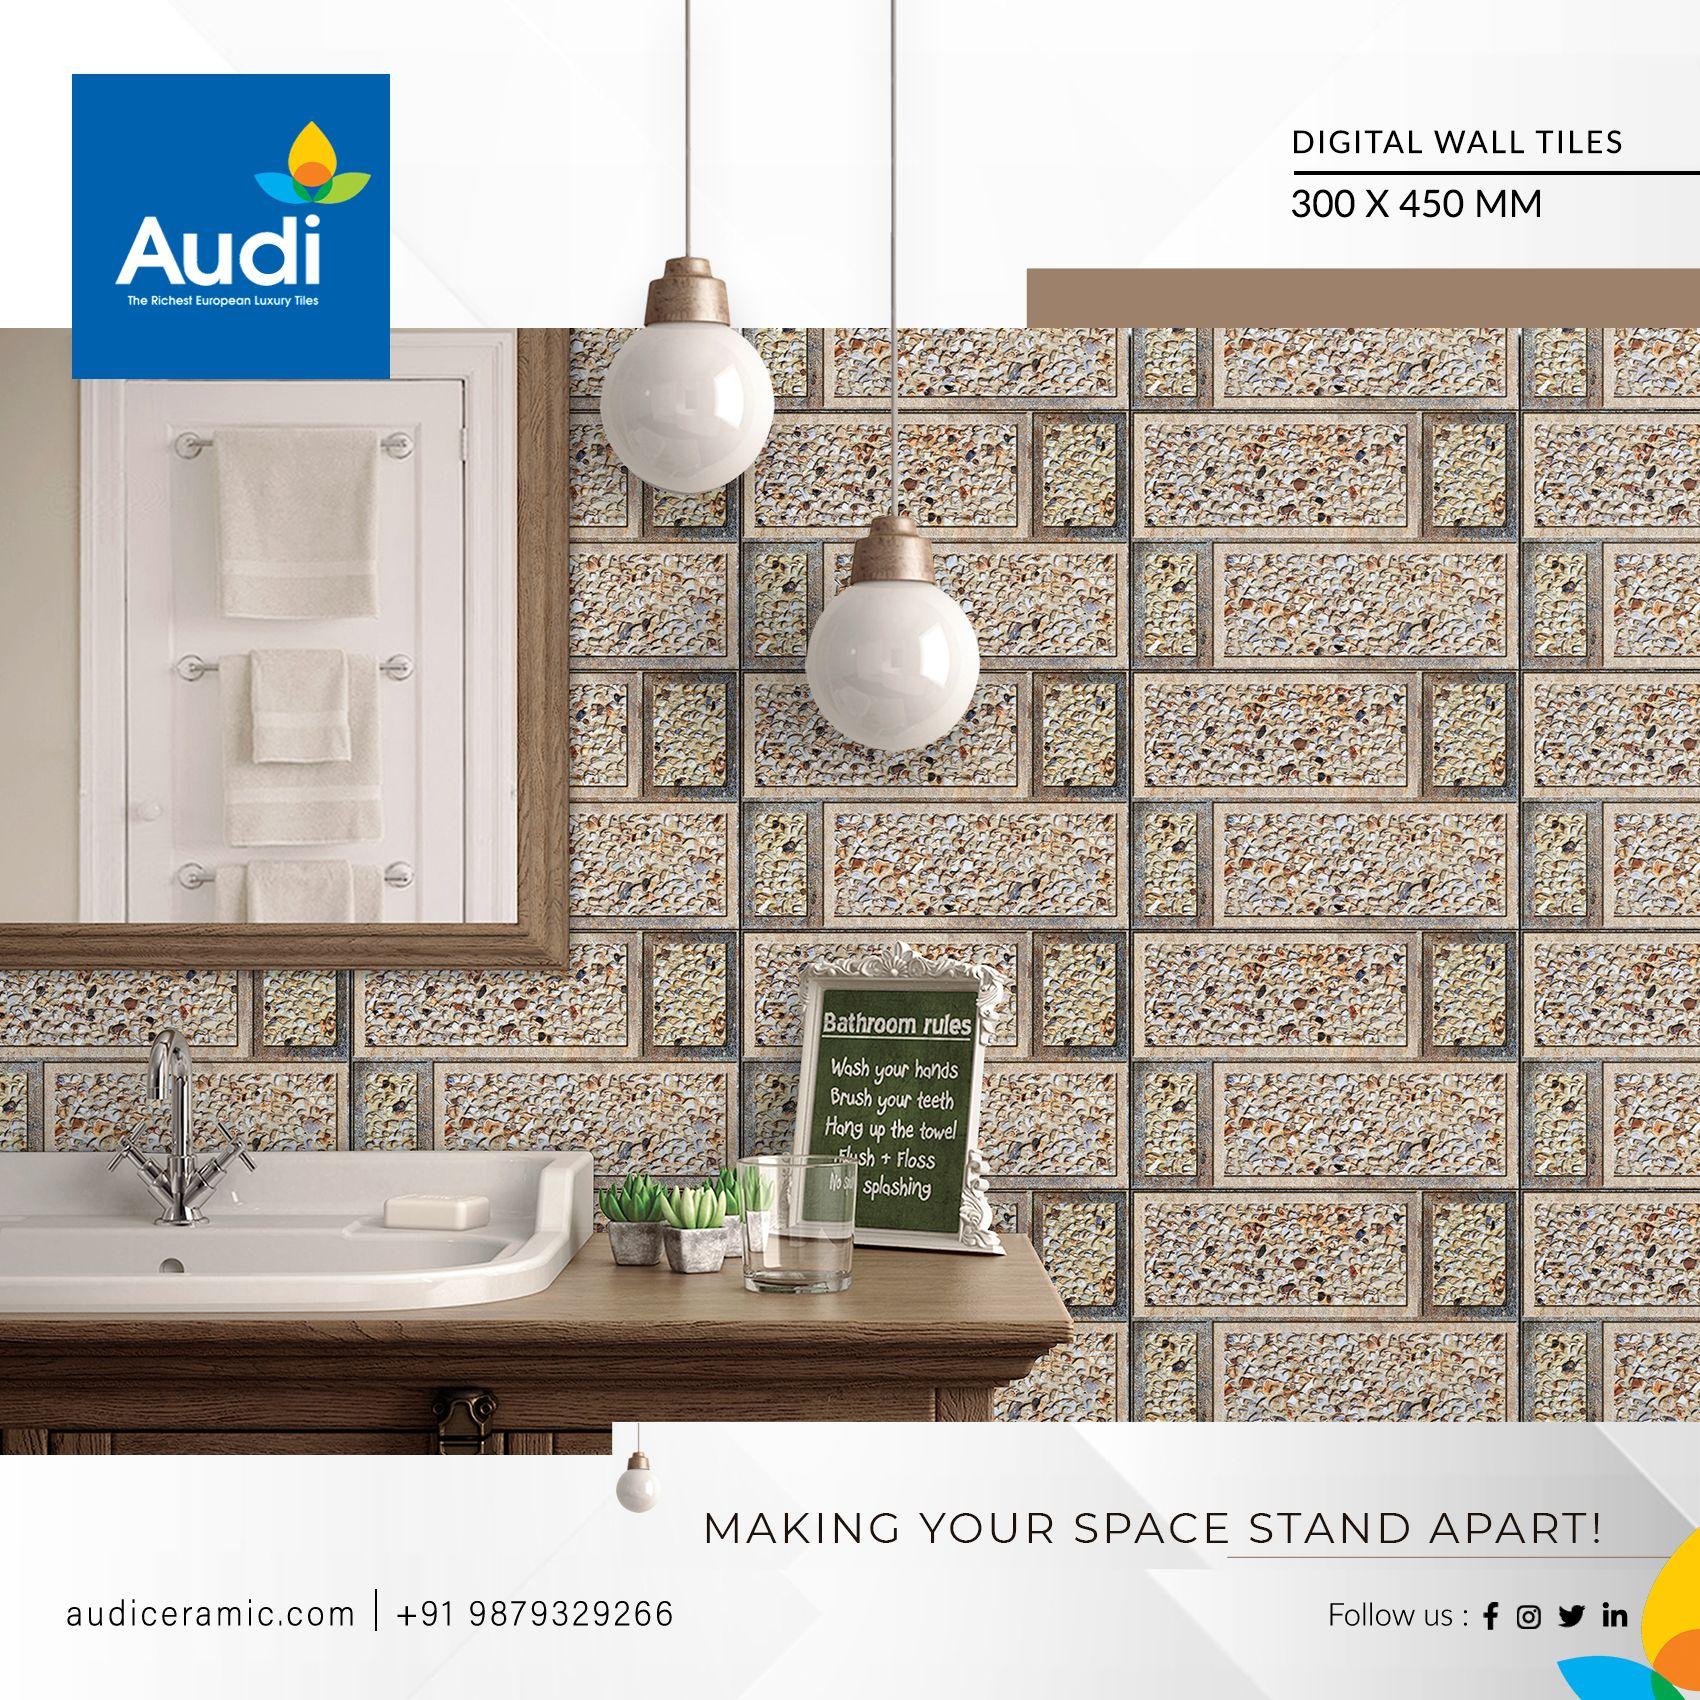 Making Your Space Stand Apart Audiceramic Homedecor Ceramictiles Walltiles Brand Interior Besttiles Wall Tiles Framed Bathroom Mirror Ceramic Tiles